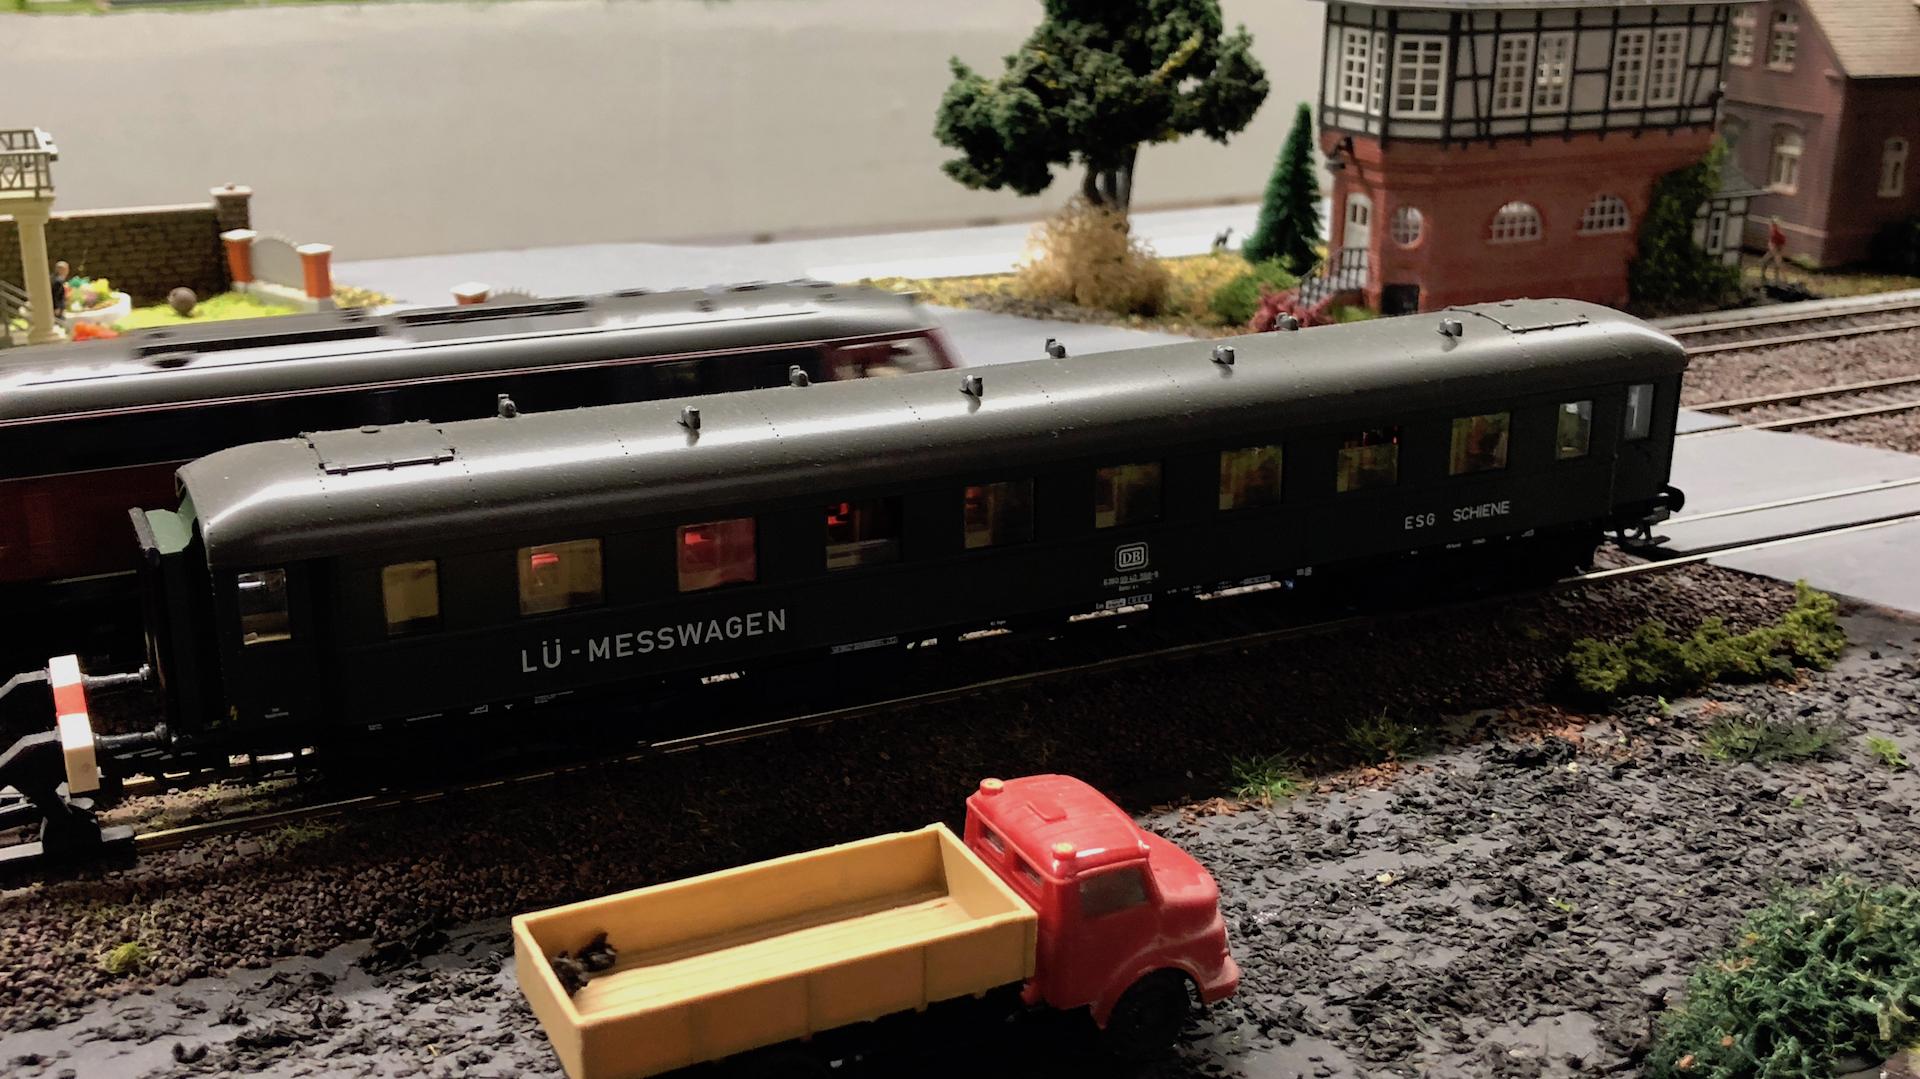 18_02_24_Schautag-Eisenbahnfreunde-Hameln_005